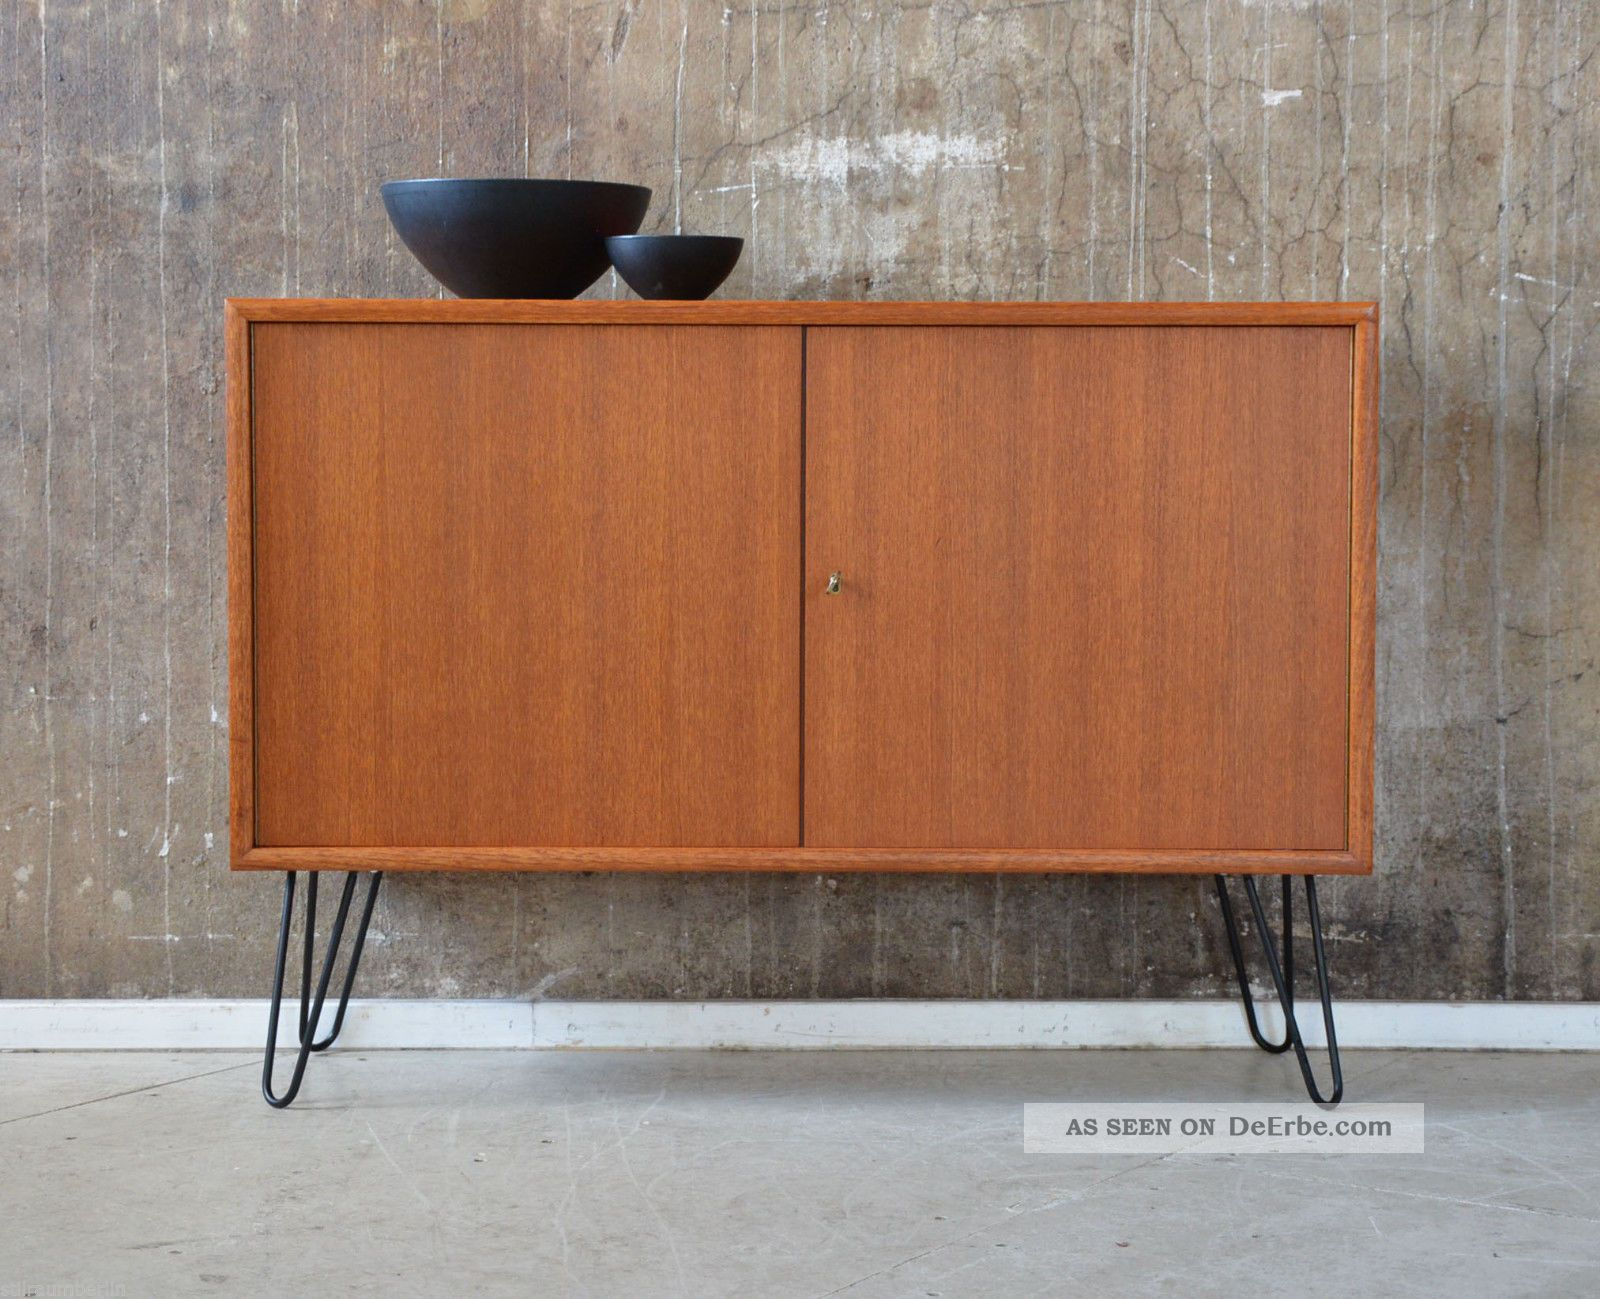 60er Wk Teak Kommode Midcentury 60s Vintage Cabinet Sideboard Tv